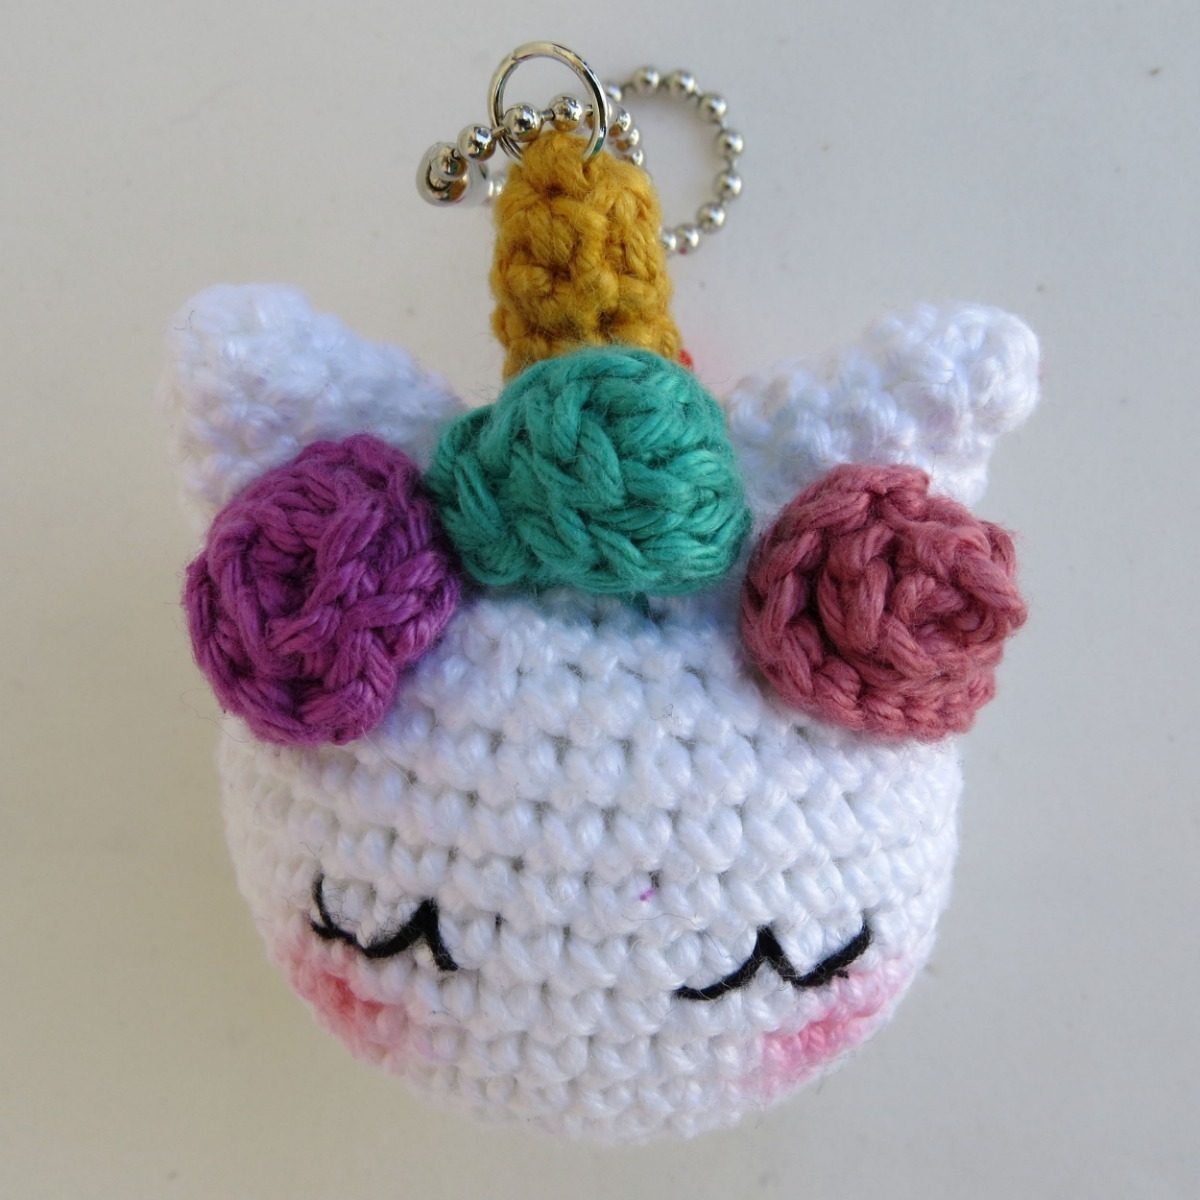 Bonequinho Amigurumi Unicórnio em Crochê | 1200x1200